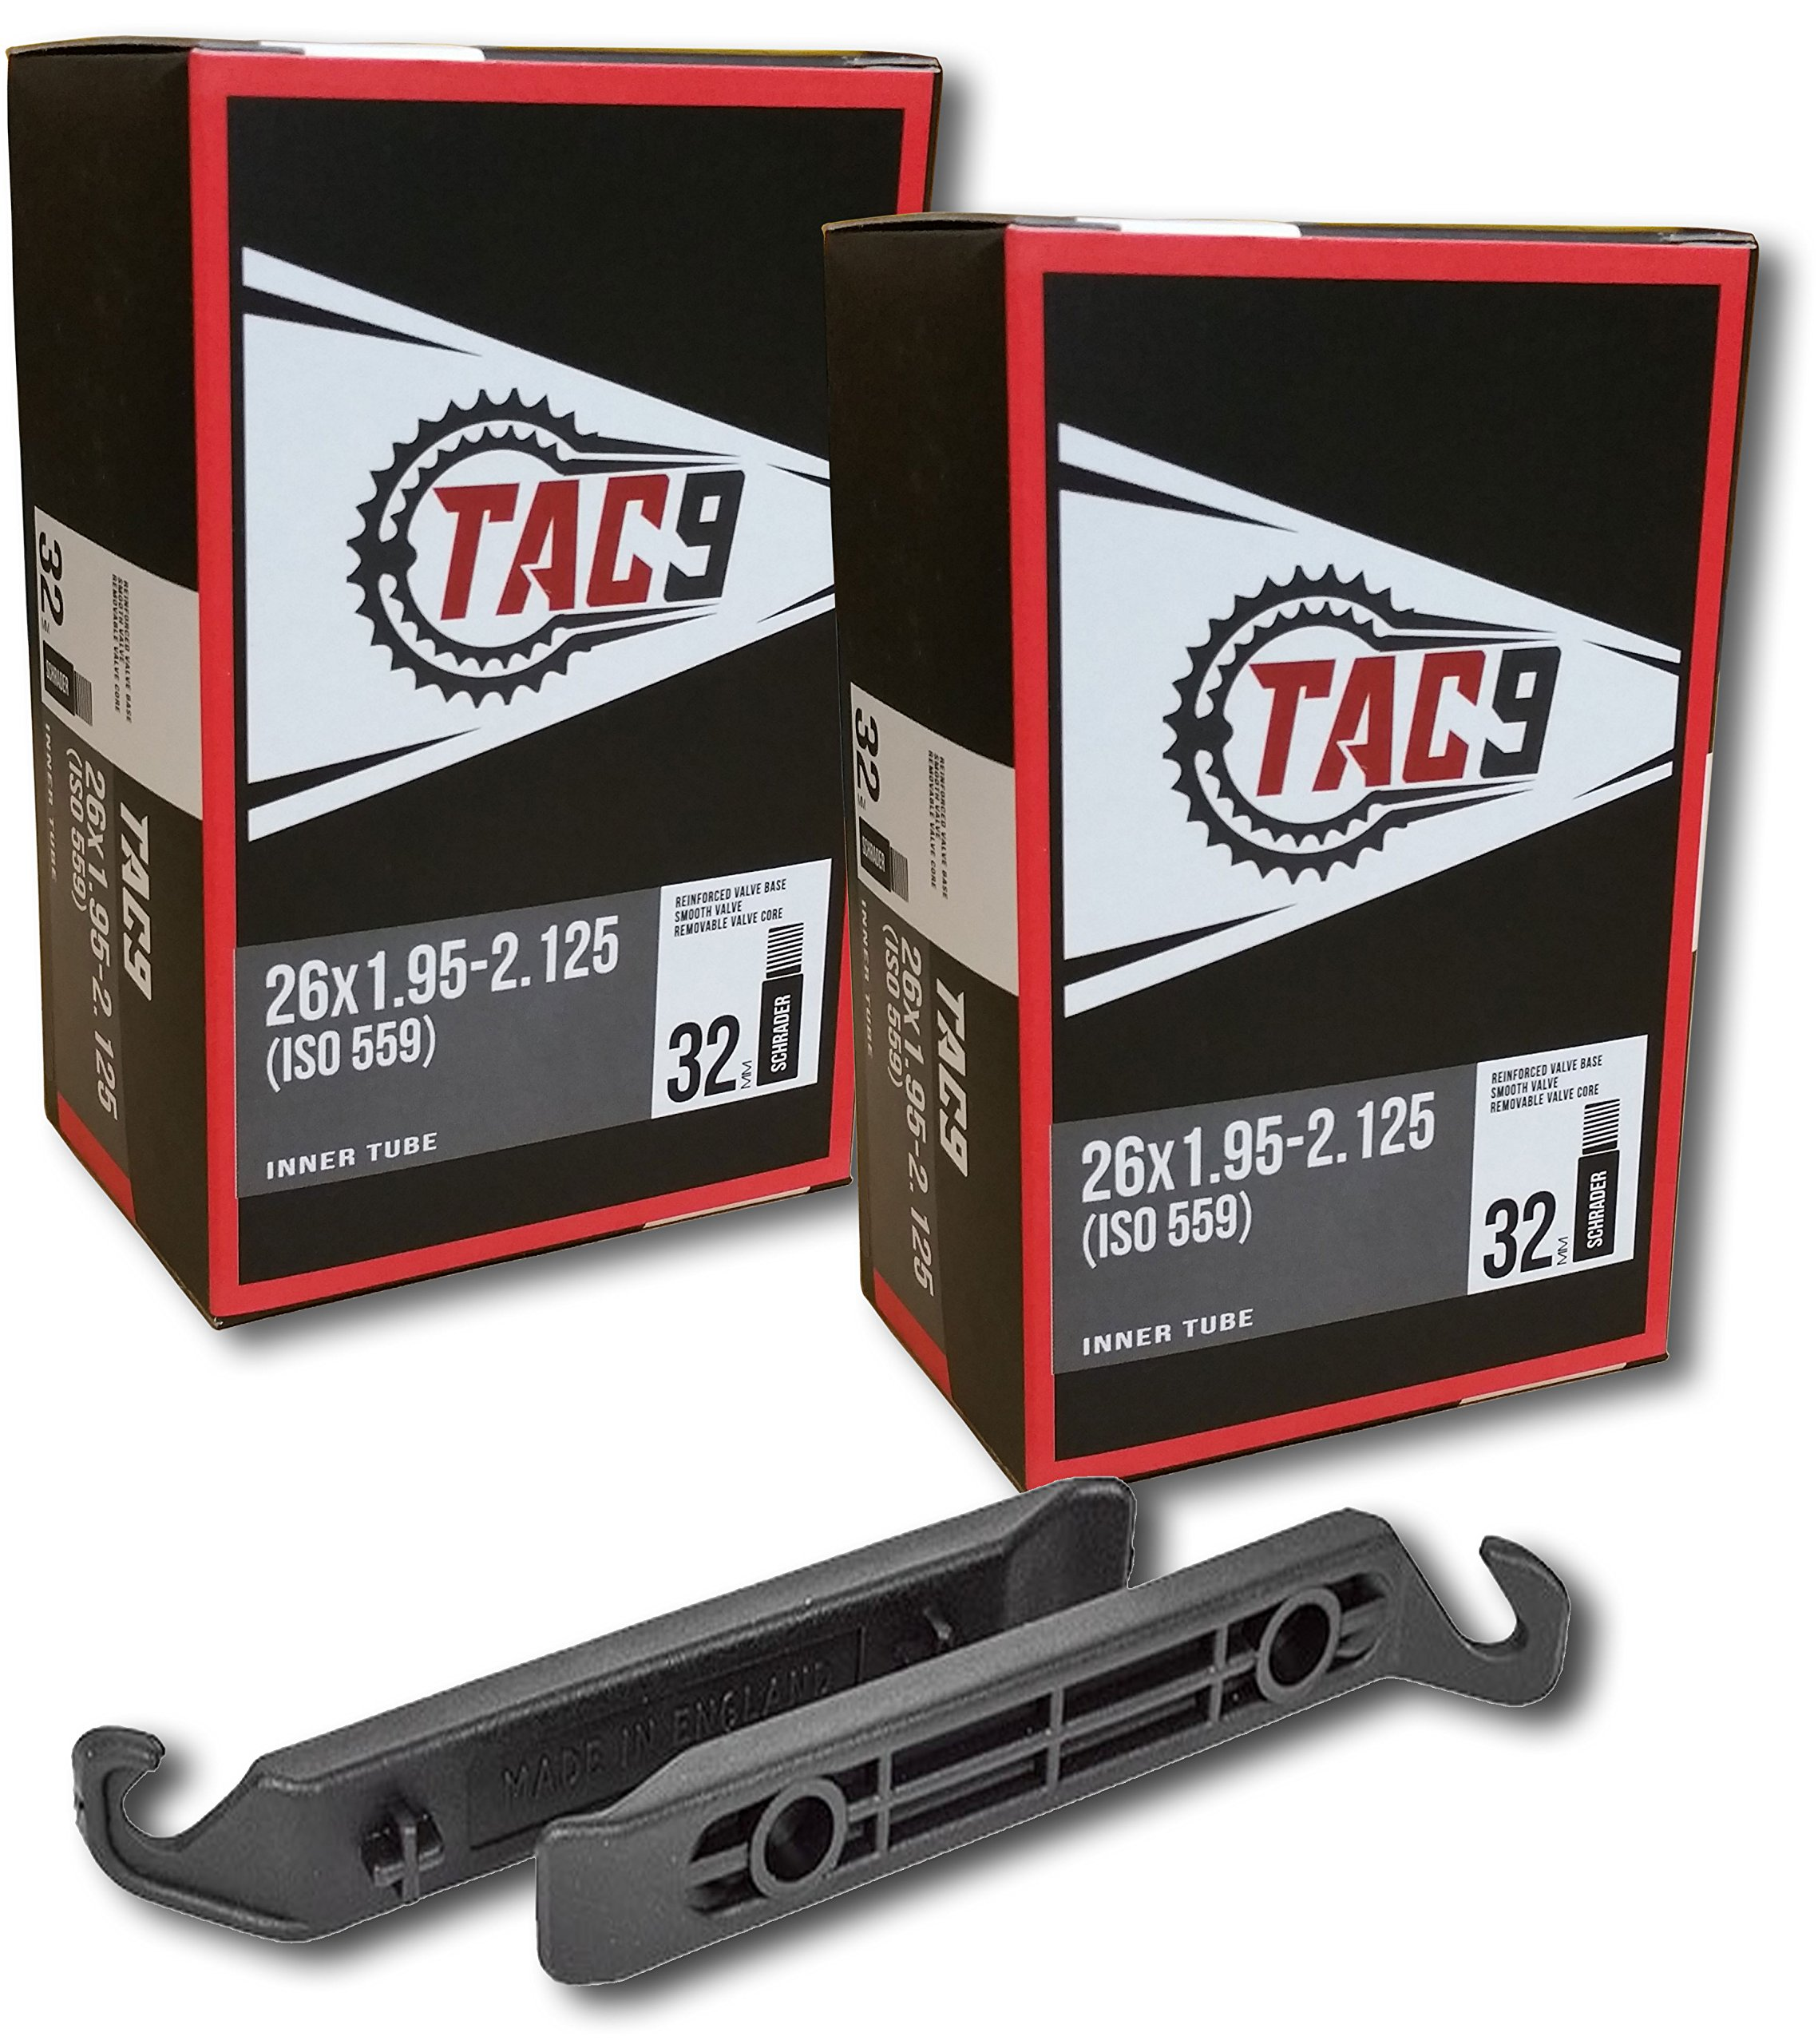 TAC 9 2 Pack Bike Tubes, 26 x 1.95-2.125'' Regular Valve 32mm - Tubes and Tire Levers ONLY Bundle by TAC 9